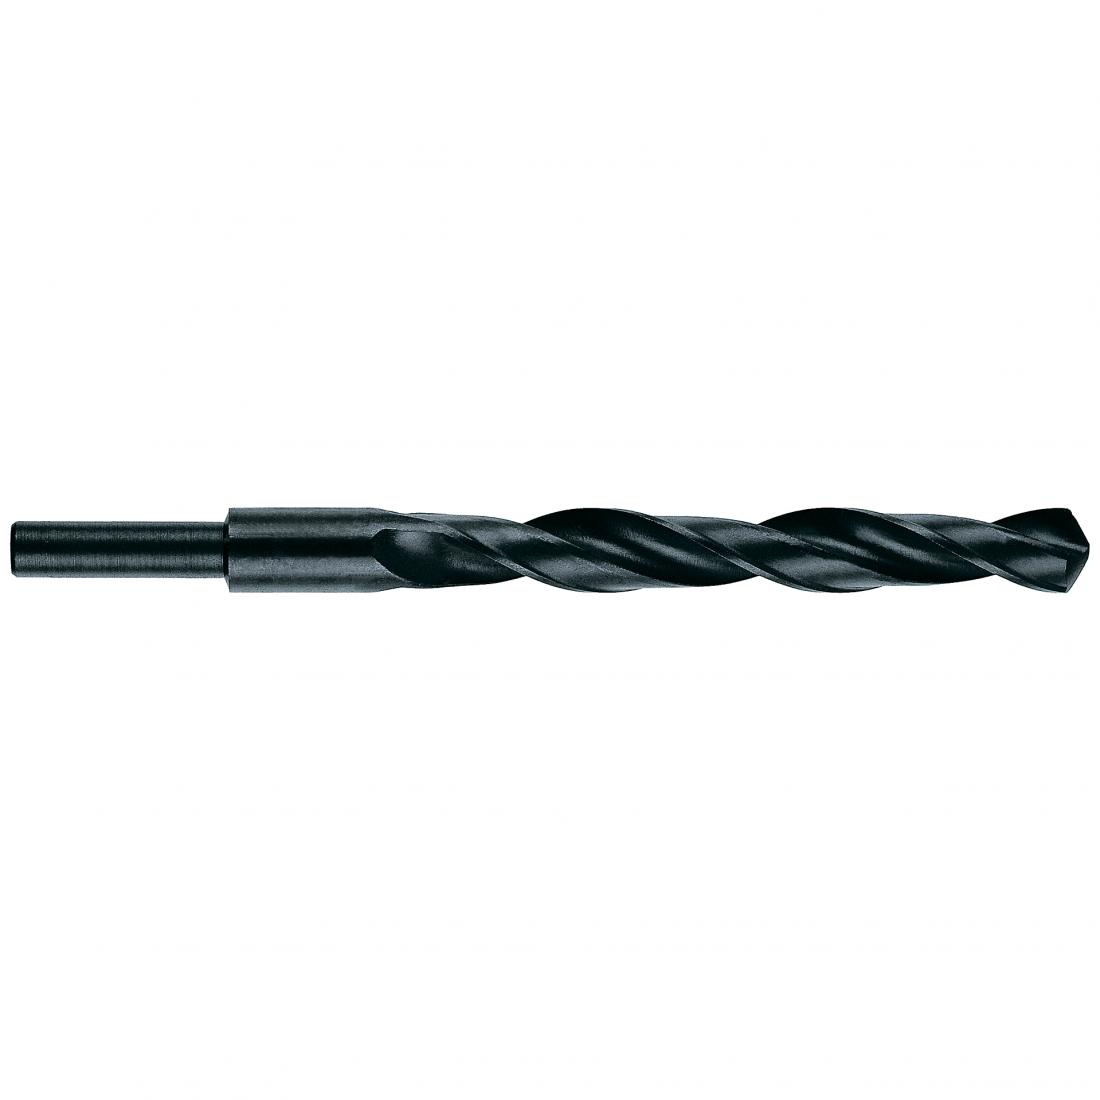 Сверло по металлу Heller HSS cо ступенчатым хвостовиком 18х130х191мм